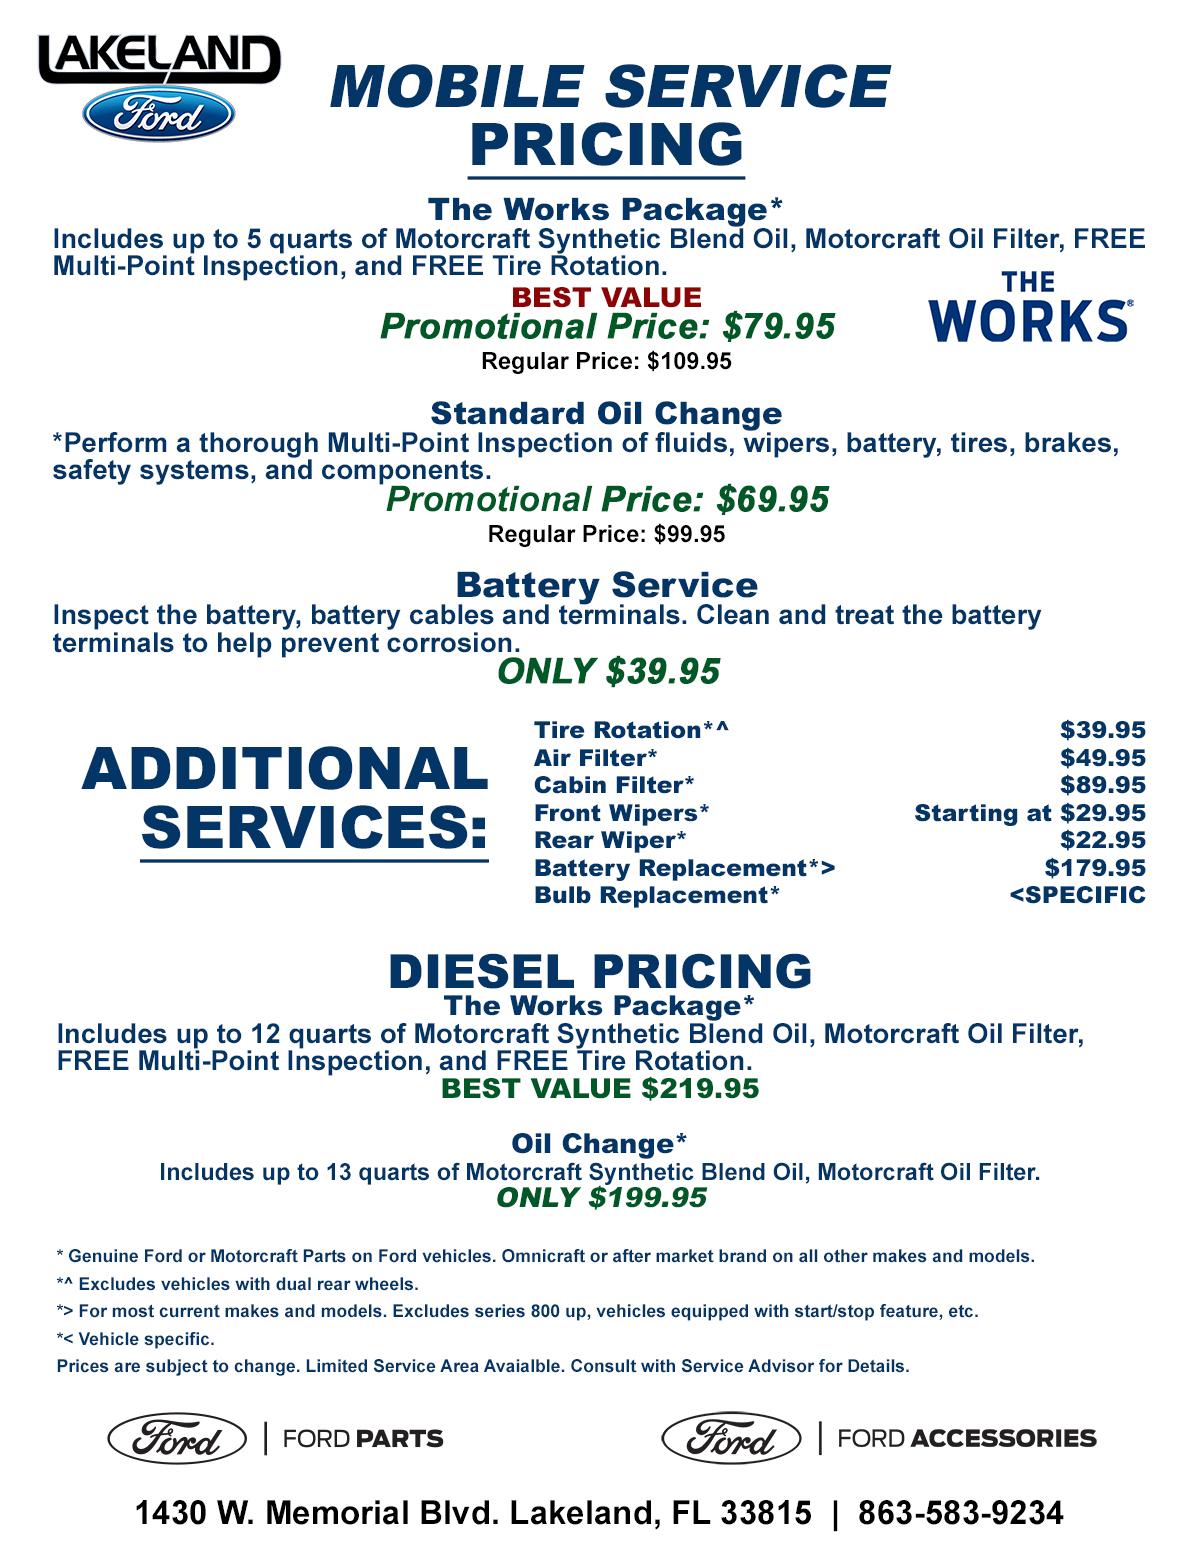 Mobile Service Pricing